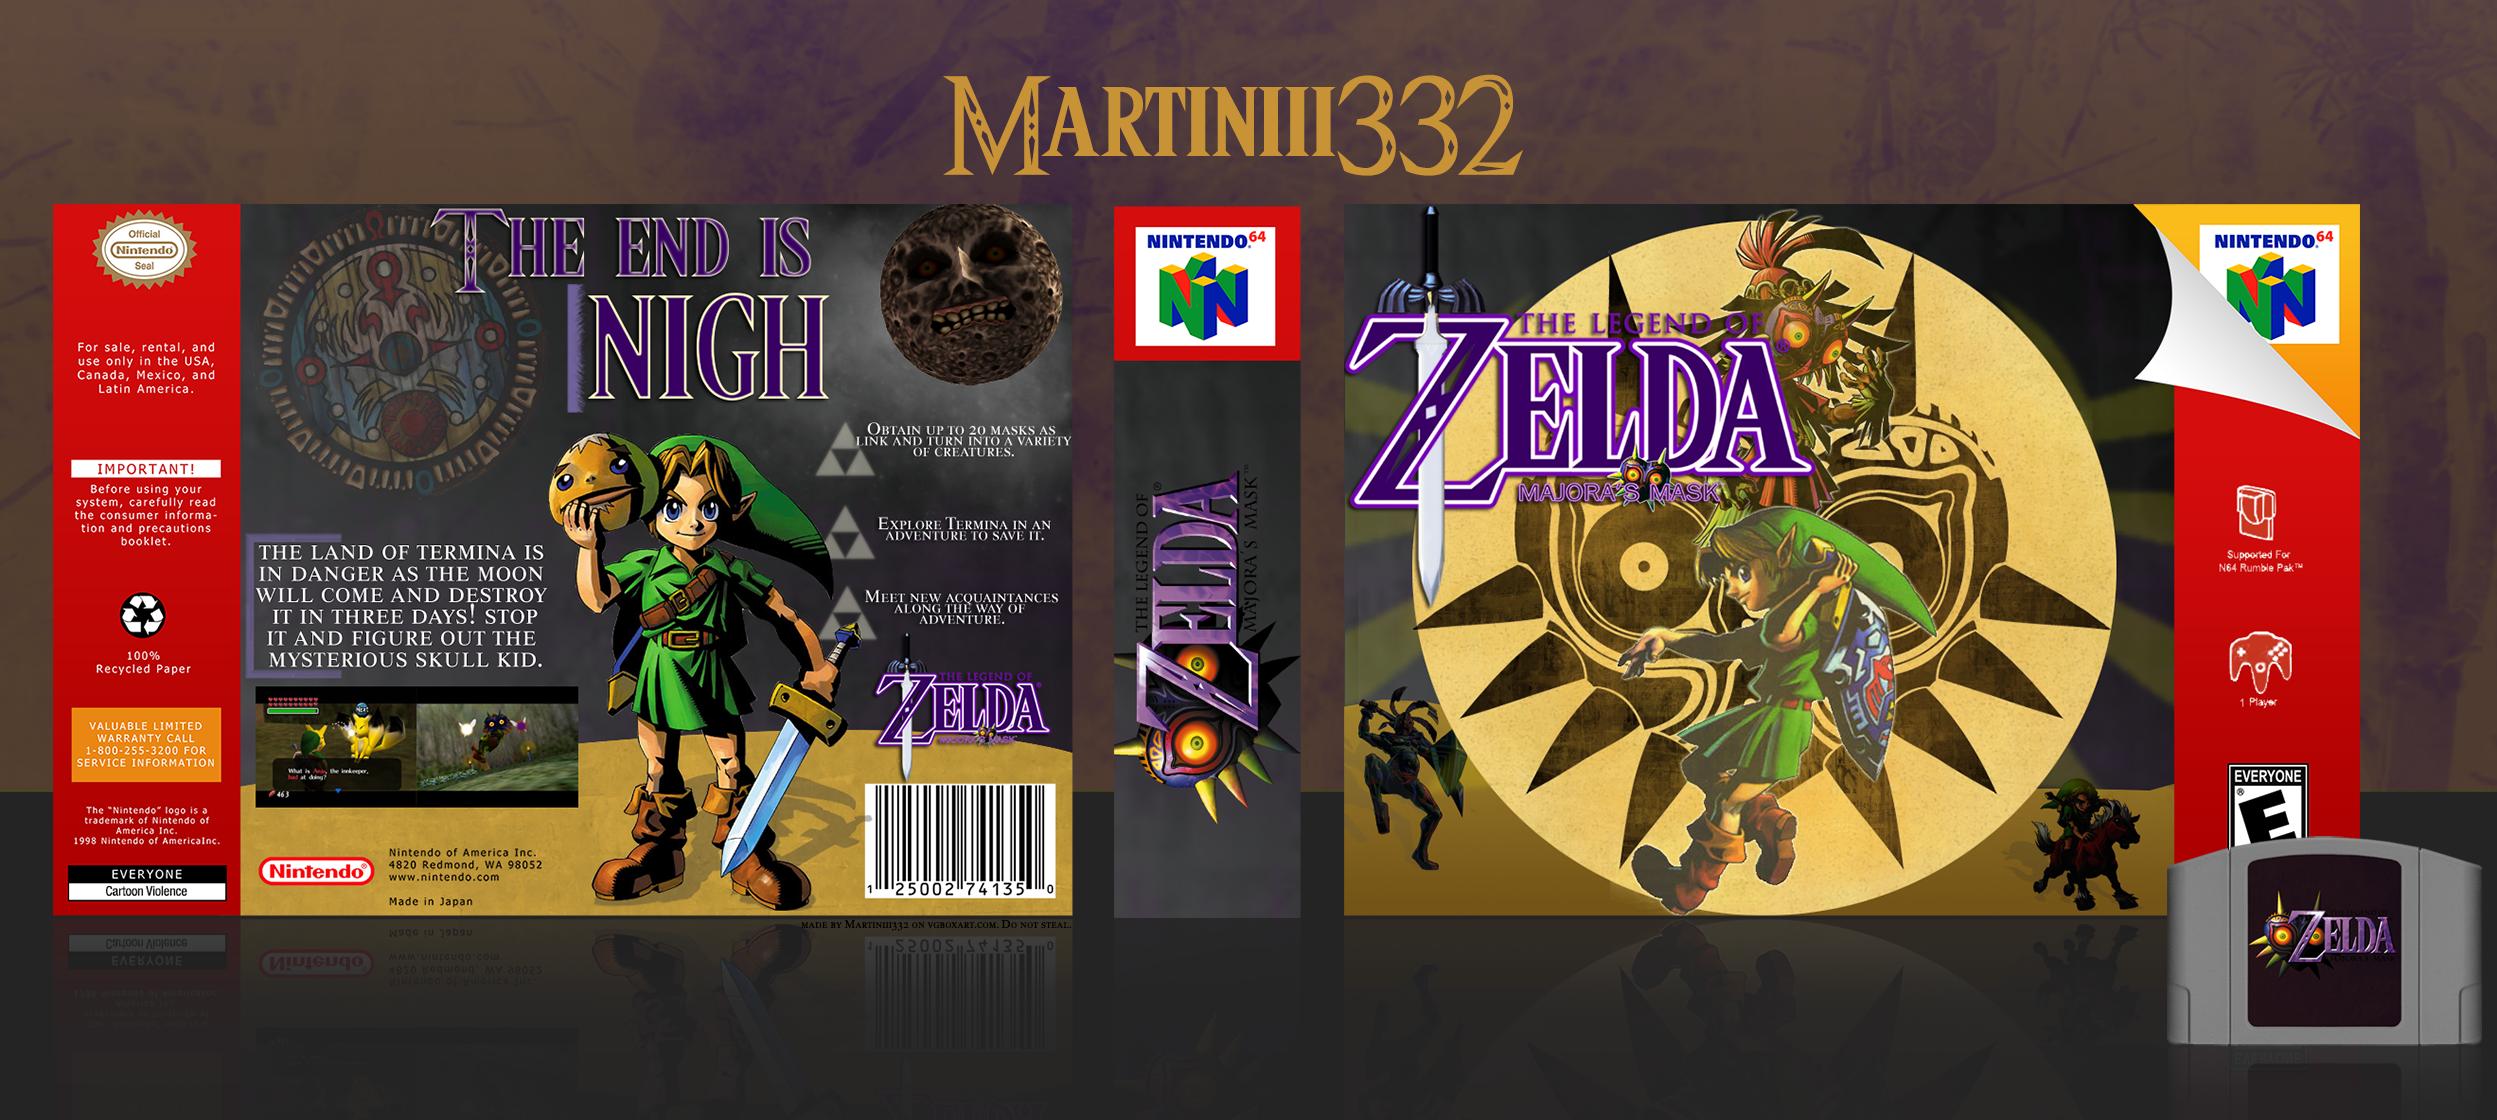 The Legend of Zelda: Majora's Mask Nintendo 64 Box Art Cover by